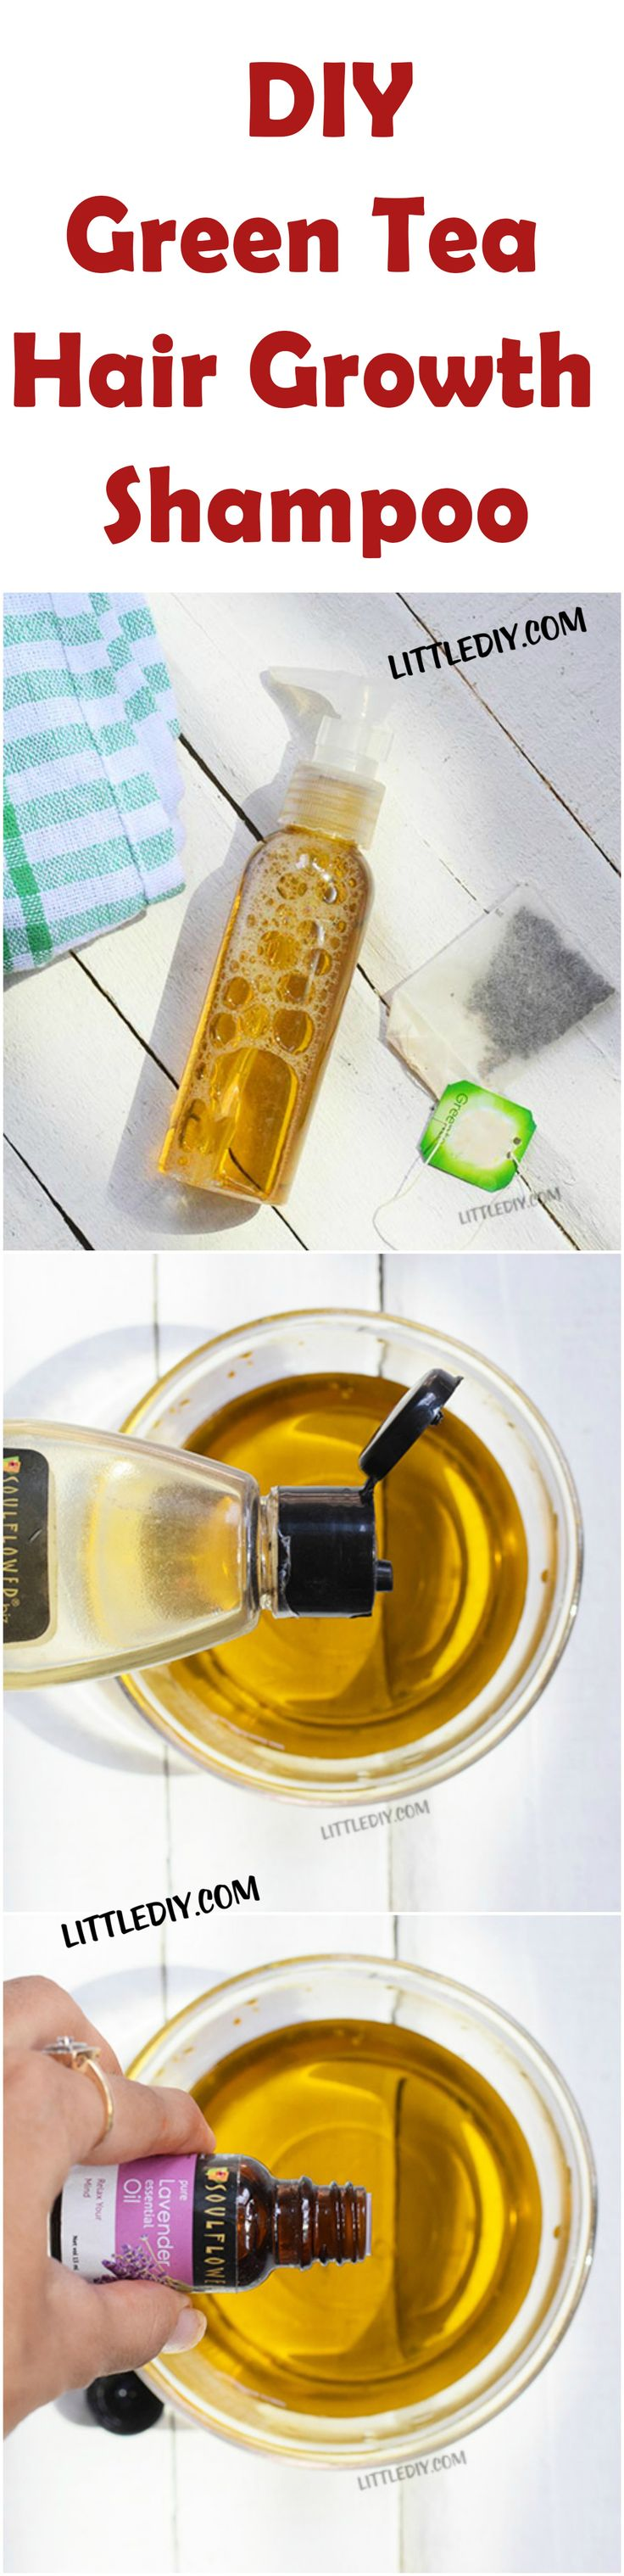 green tea hair growth shampoo - #diy #shampoo #tea